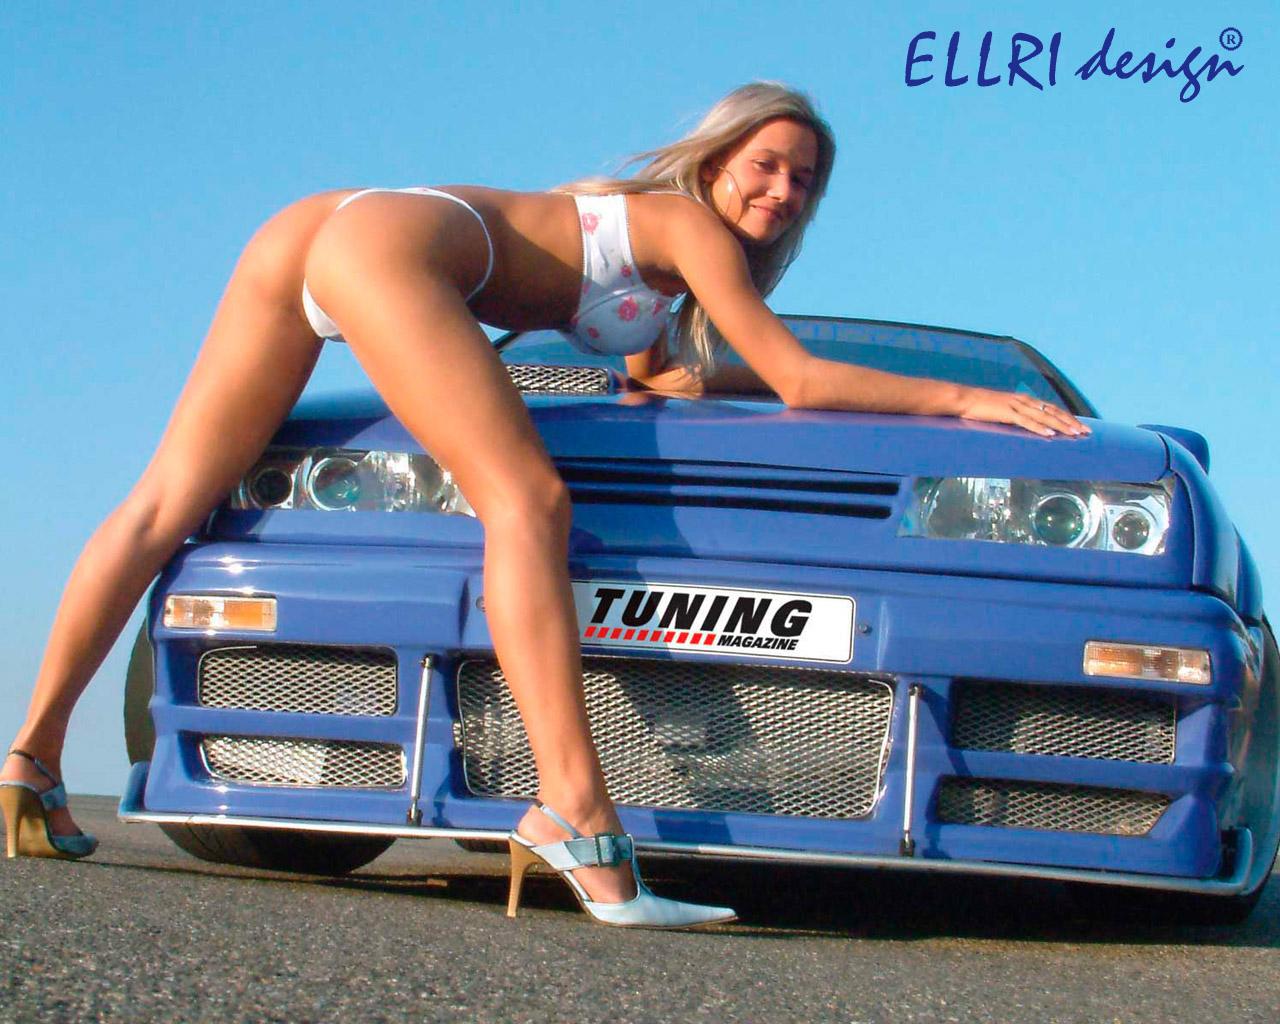 Фото голые девушки и ваз, Ваз и девушки ВКонтакте 15 фотография